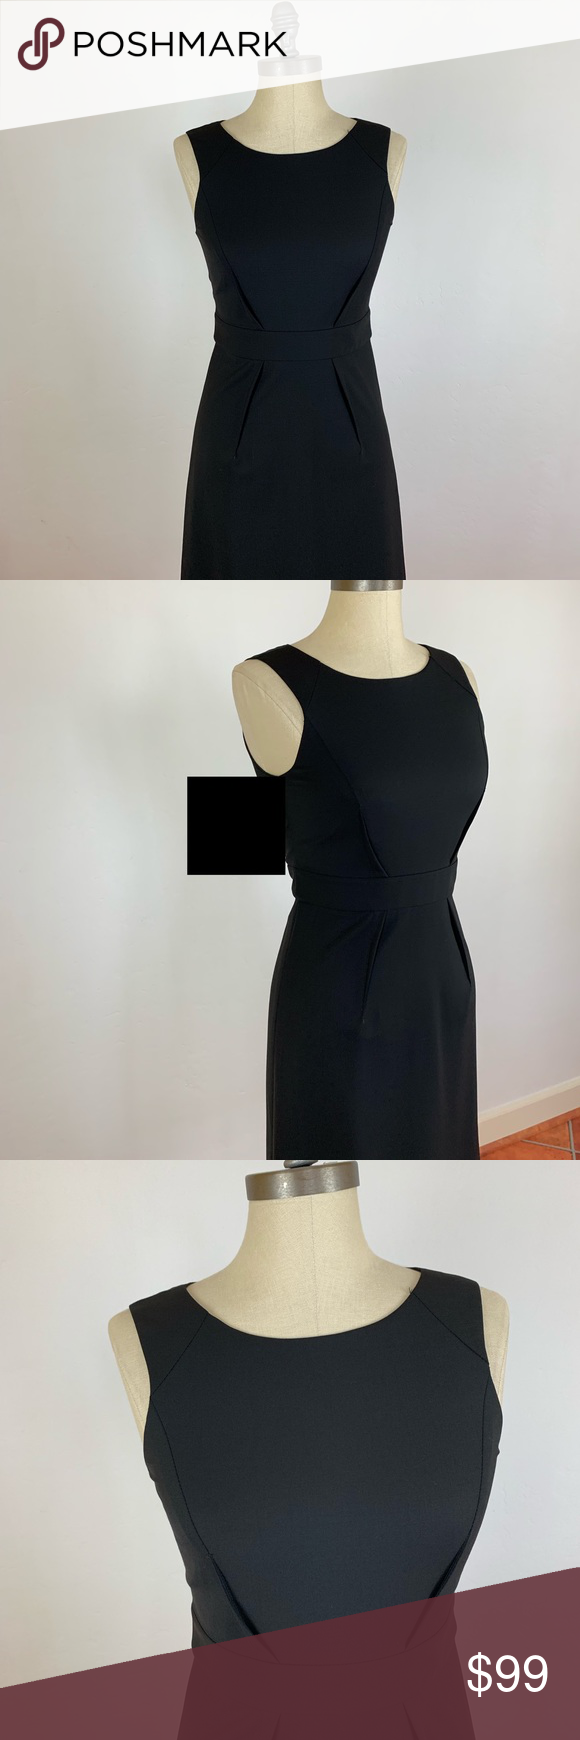 Theory Ennah Black Dress Black Dress Dresses Theory Dress [ 1740 x 580 Pixel ]